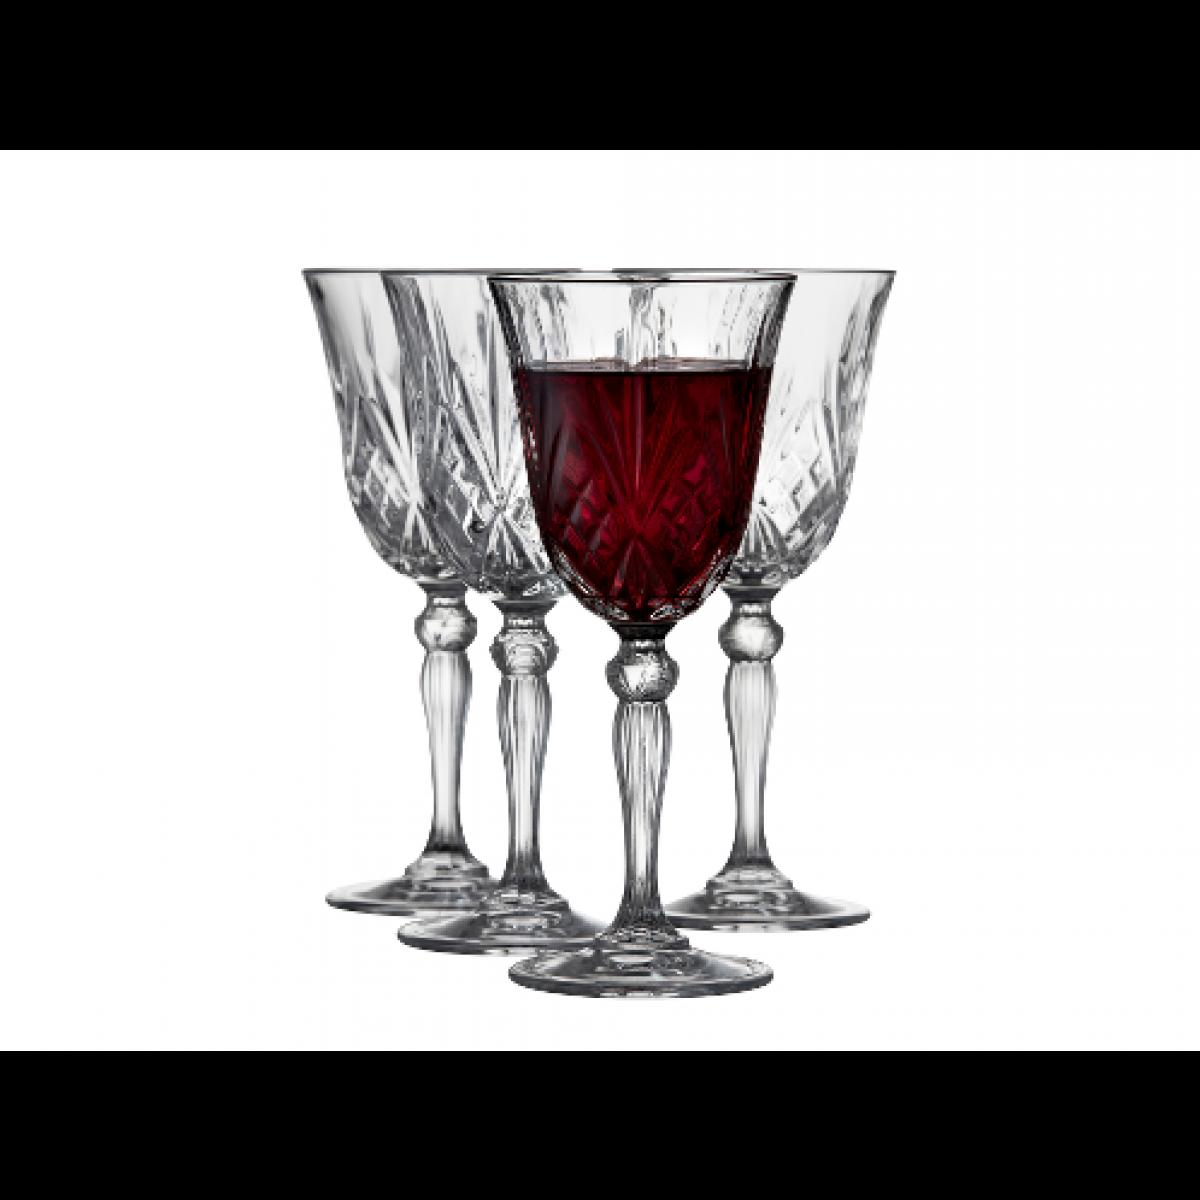 LYNGBY Melodia krystal rødvinsglas 27 cl 4 stk